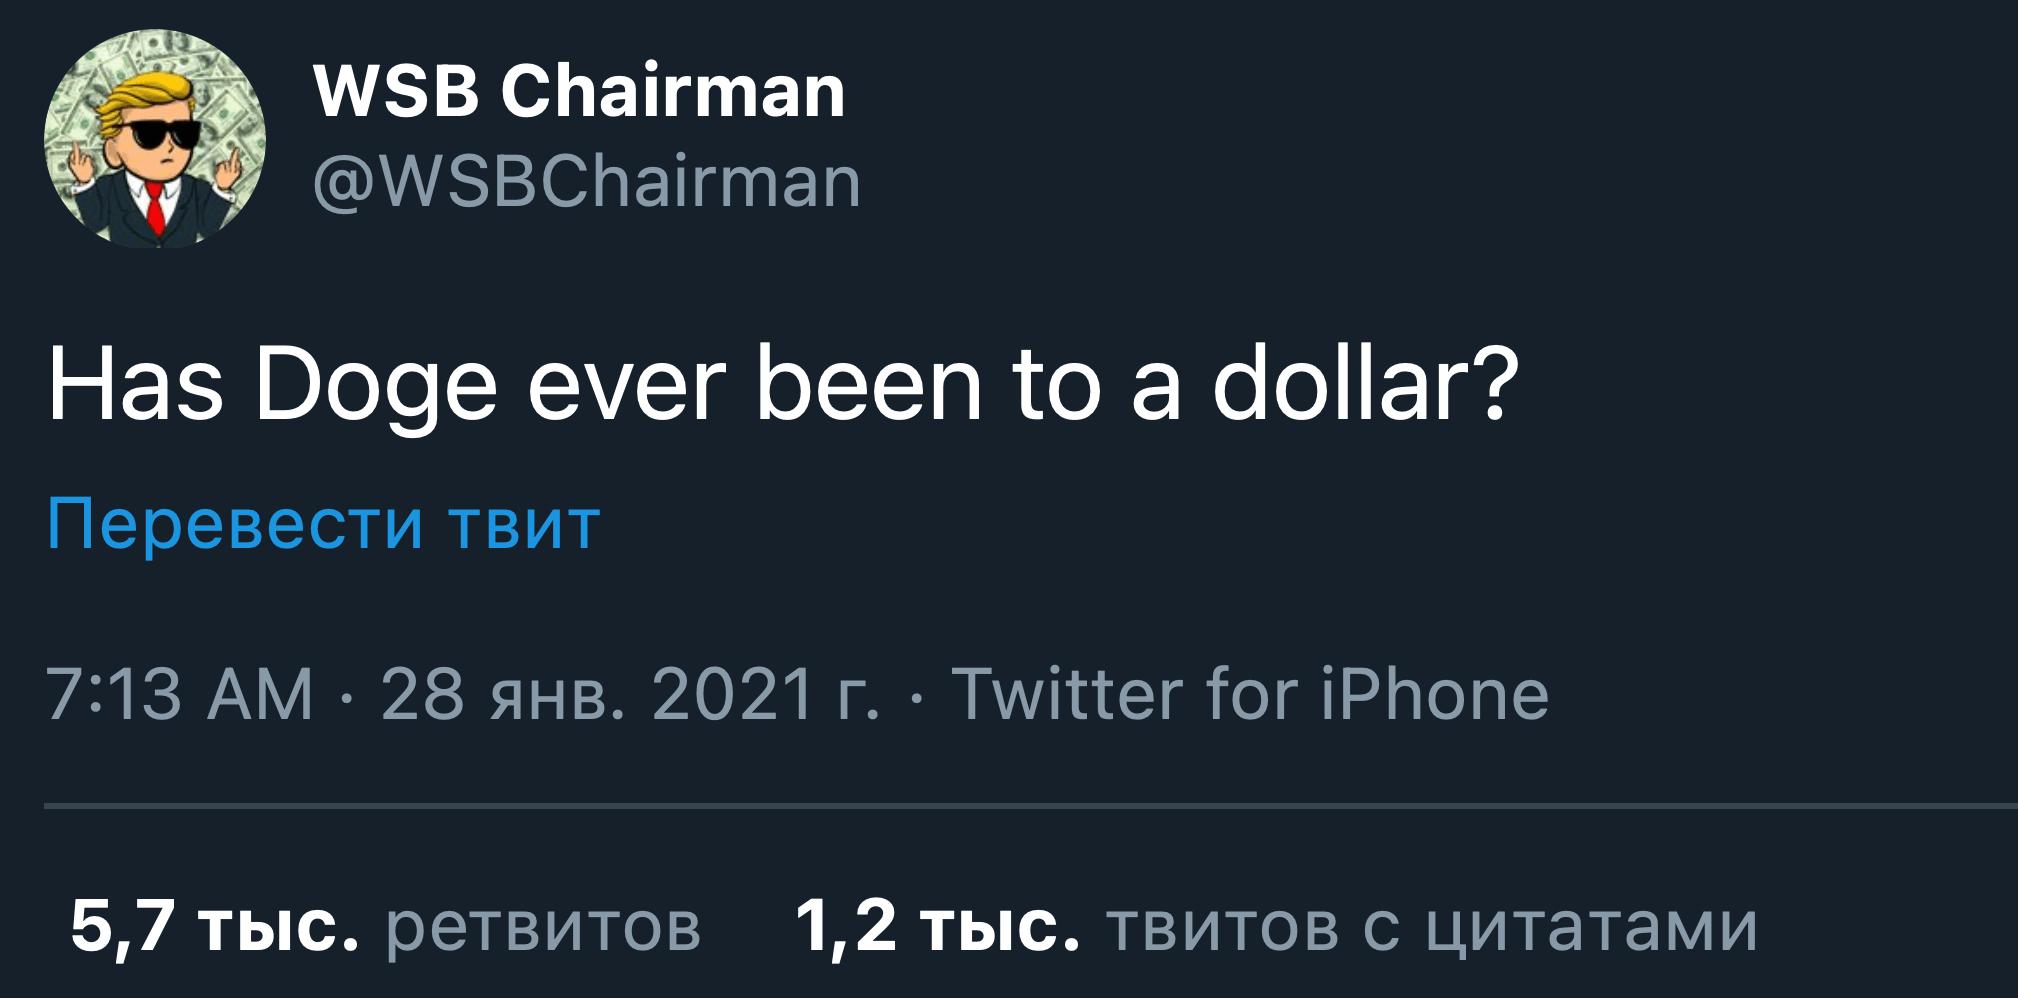 Твит Dogecoin